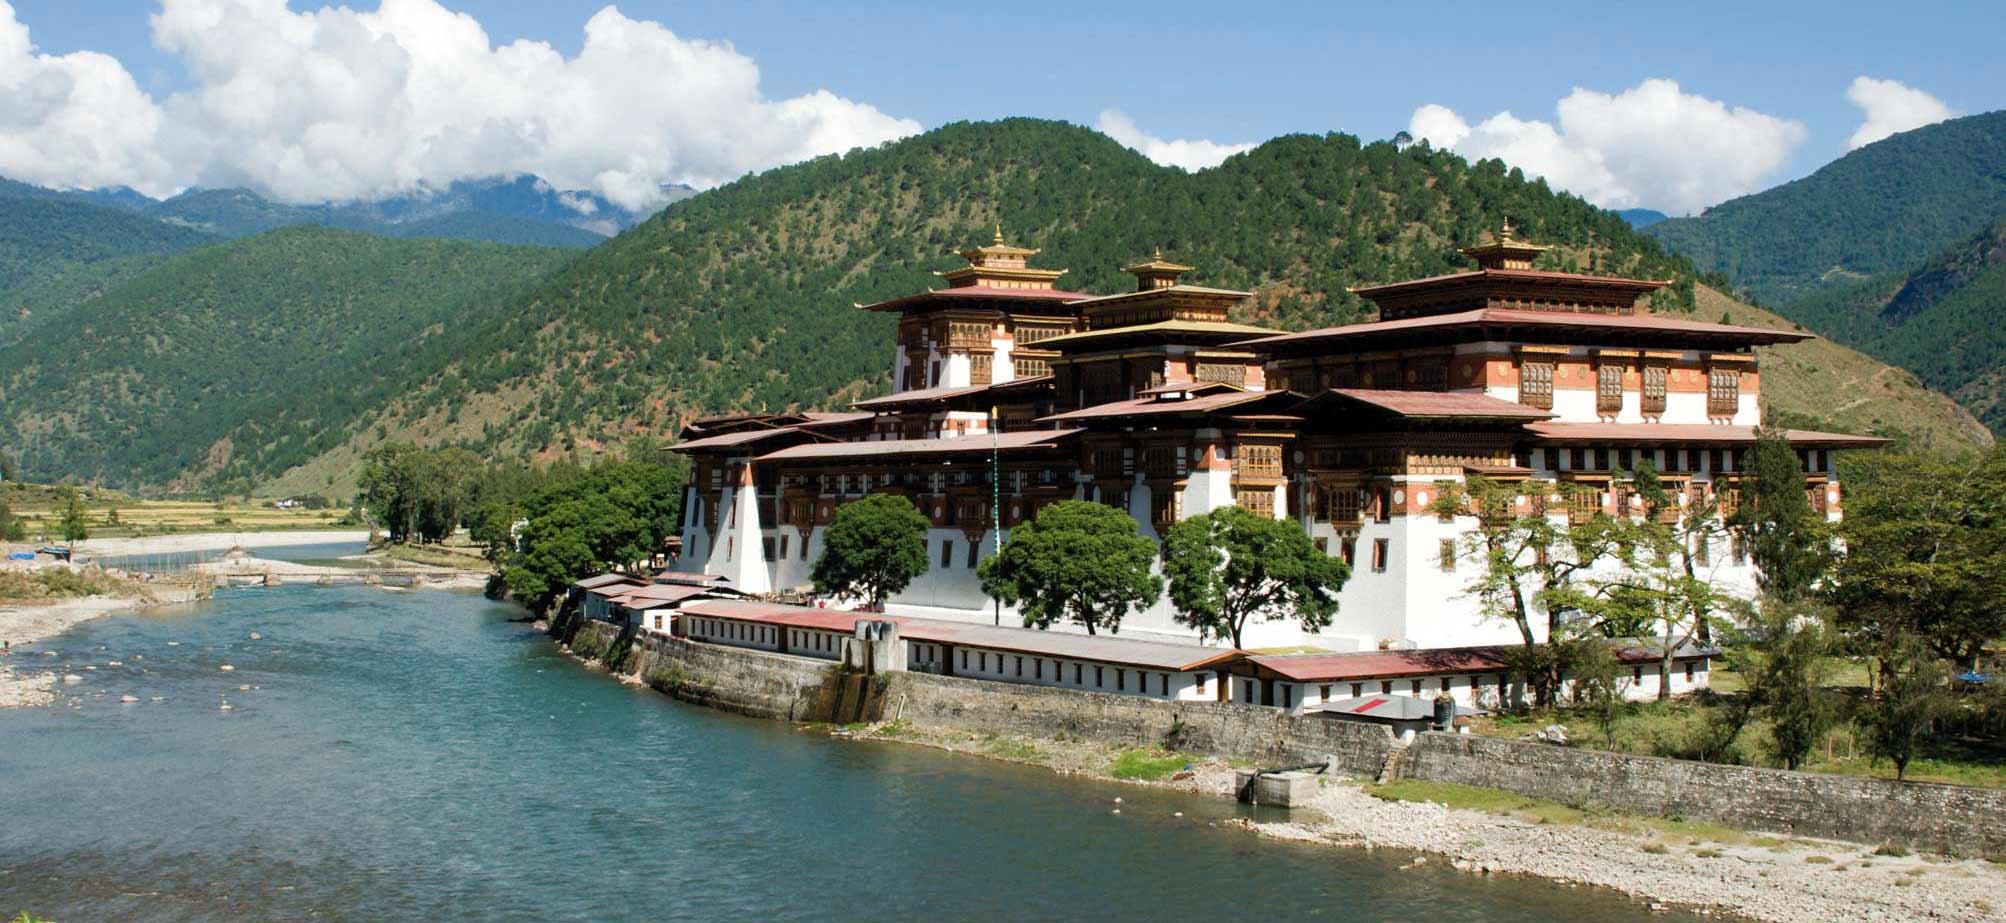 bhutan-punakh-monastery.jpg